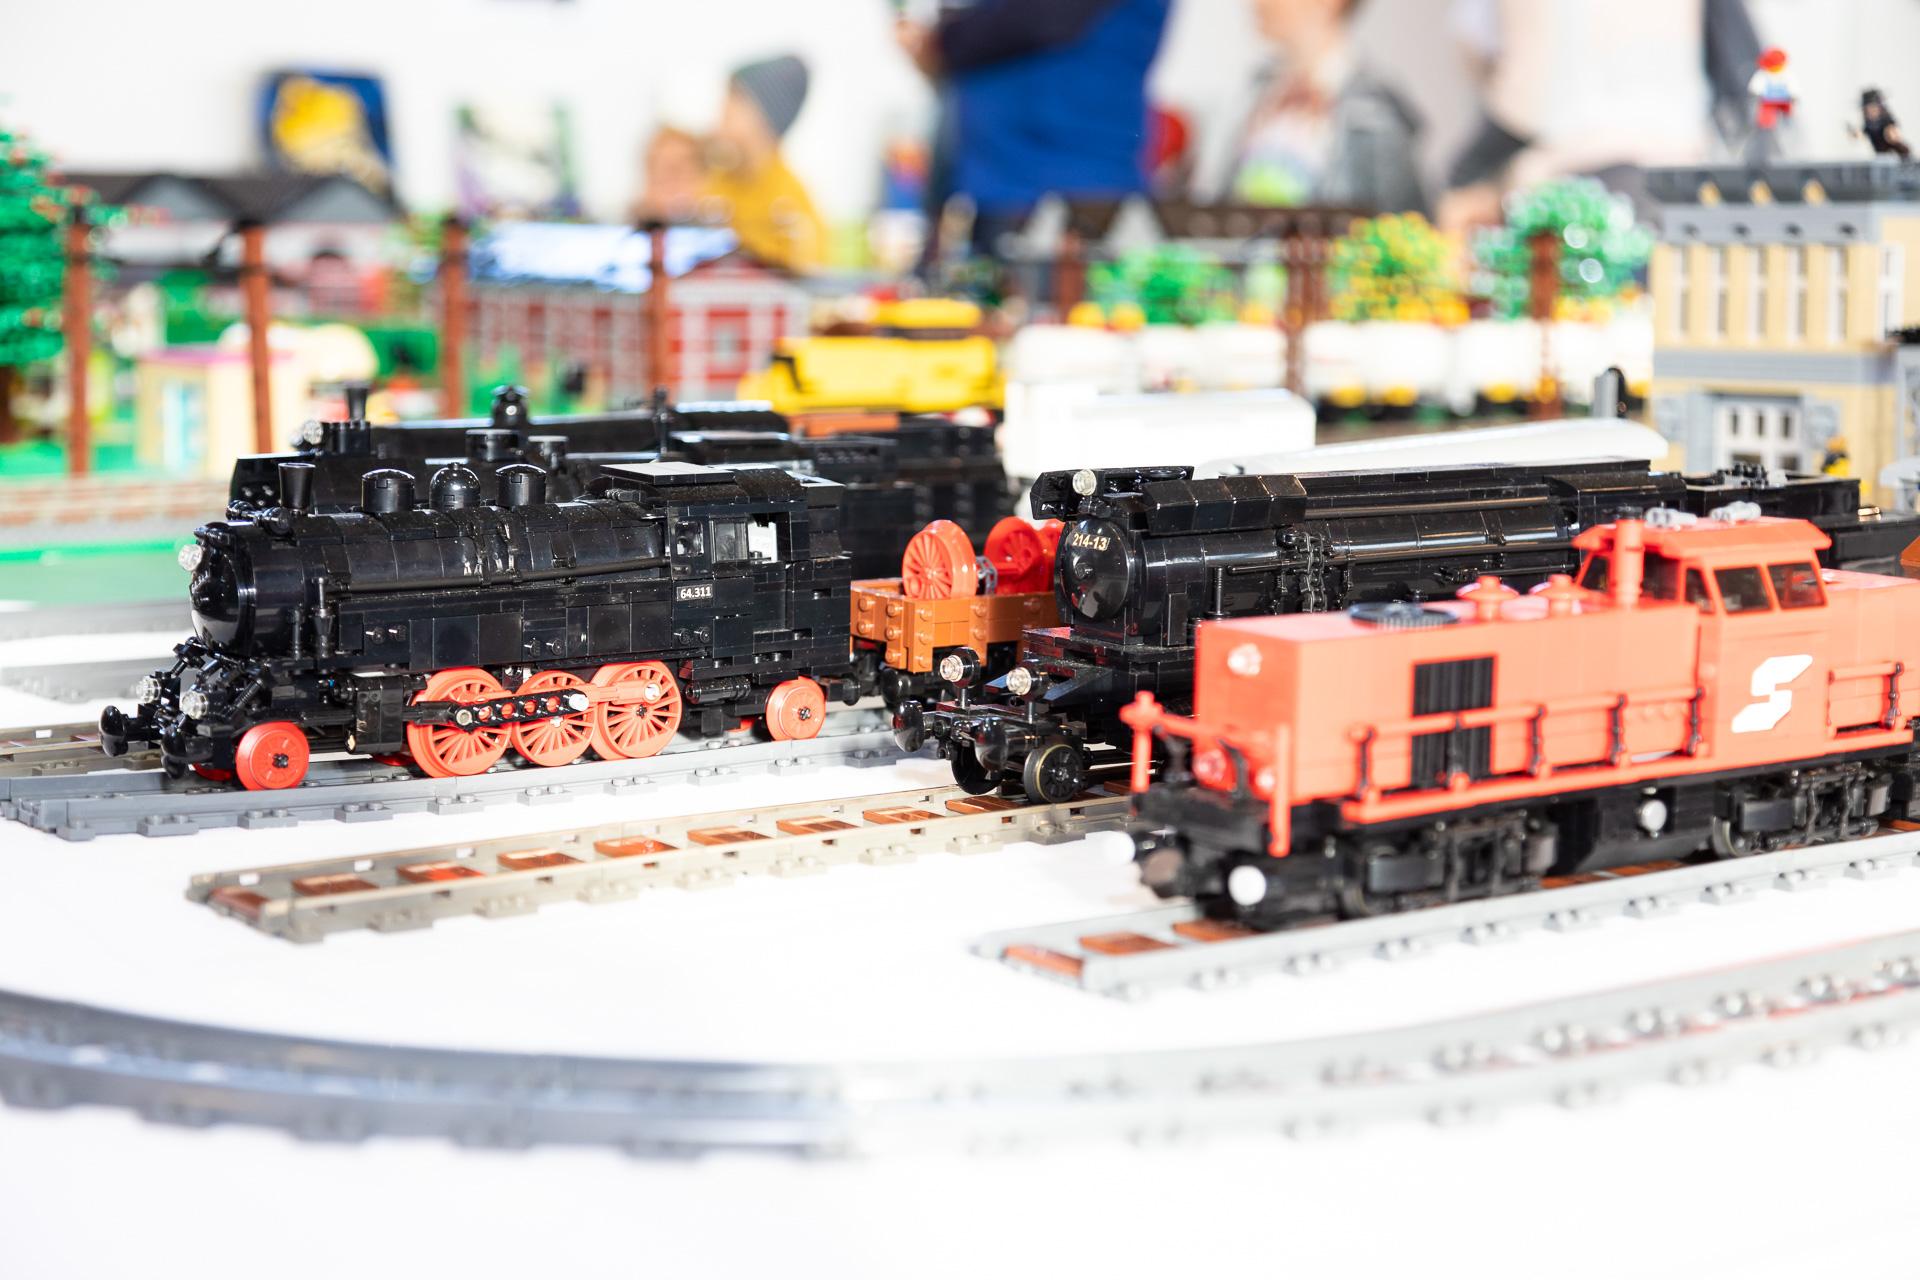 MG_4528